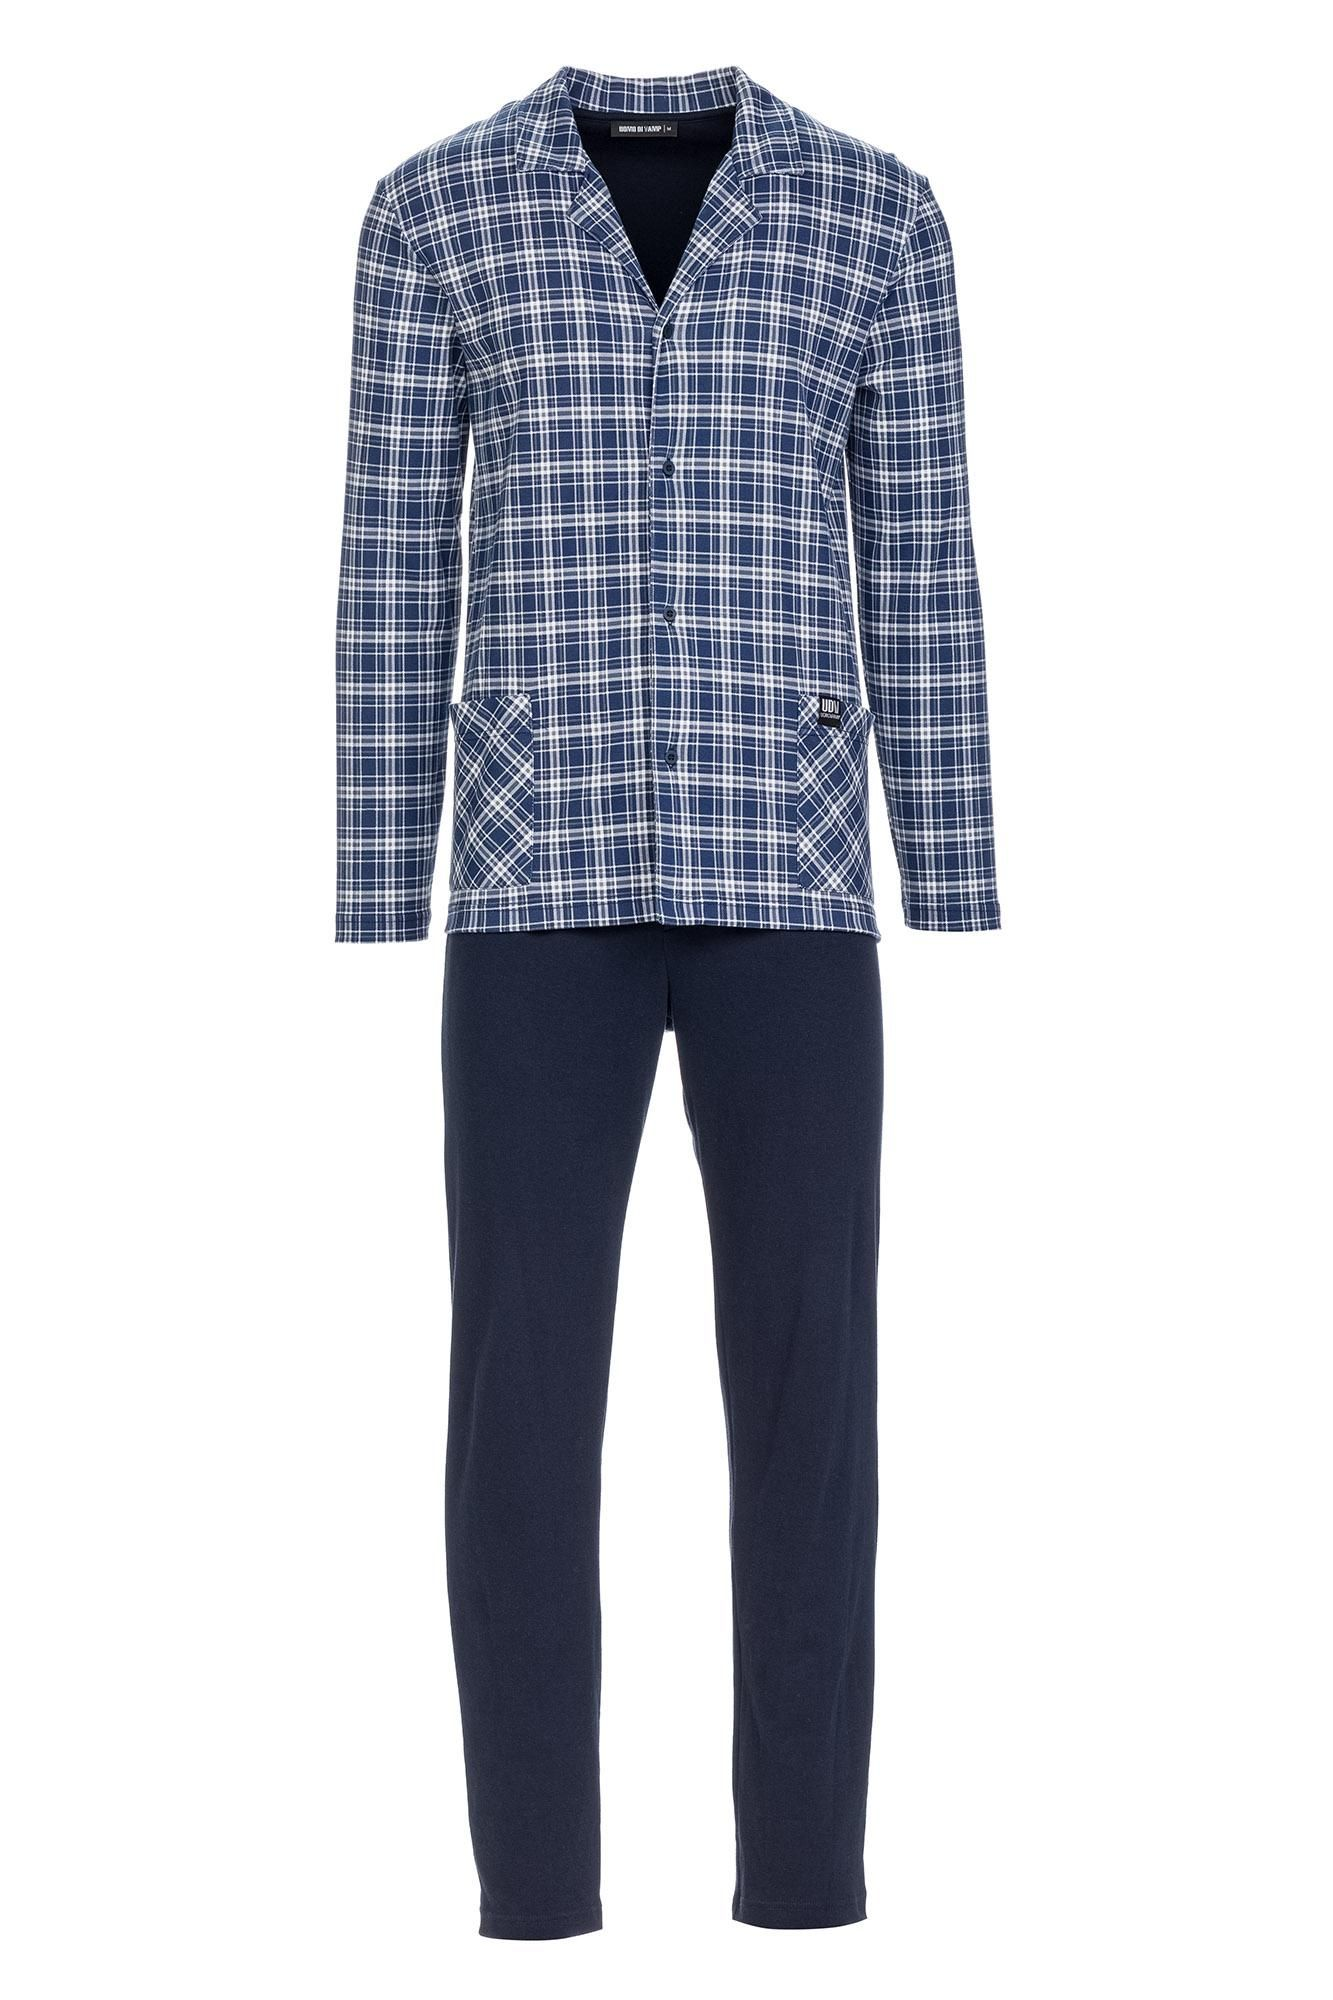 Men's Plaid Buttoned Pyjamas